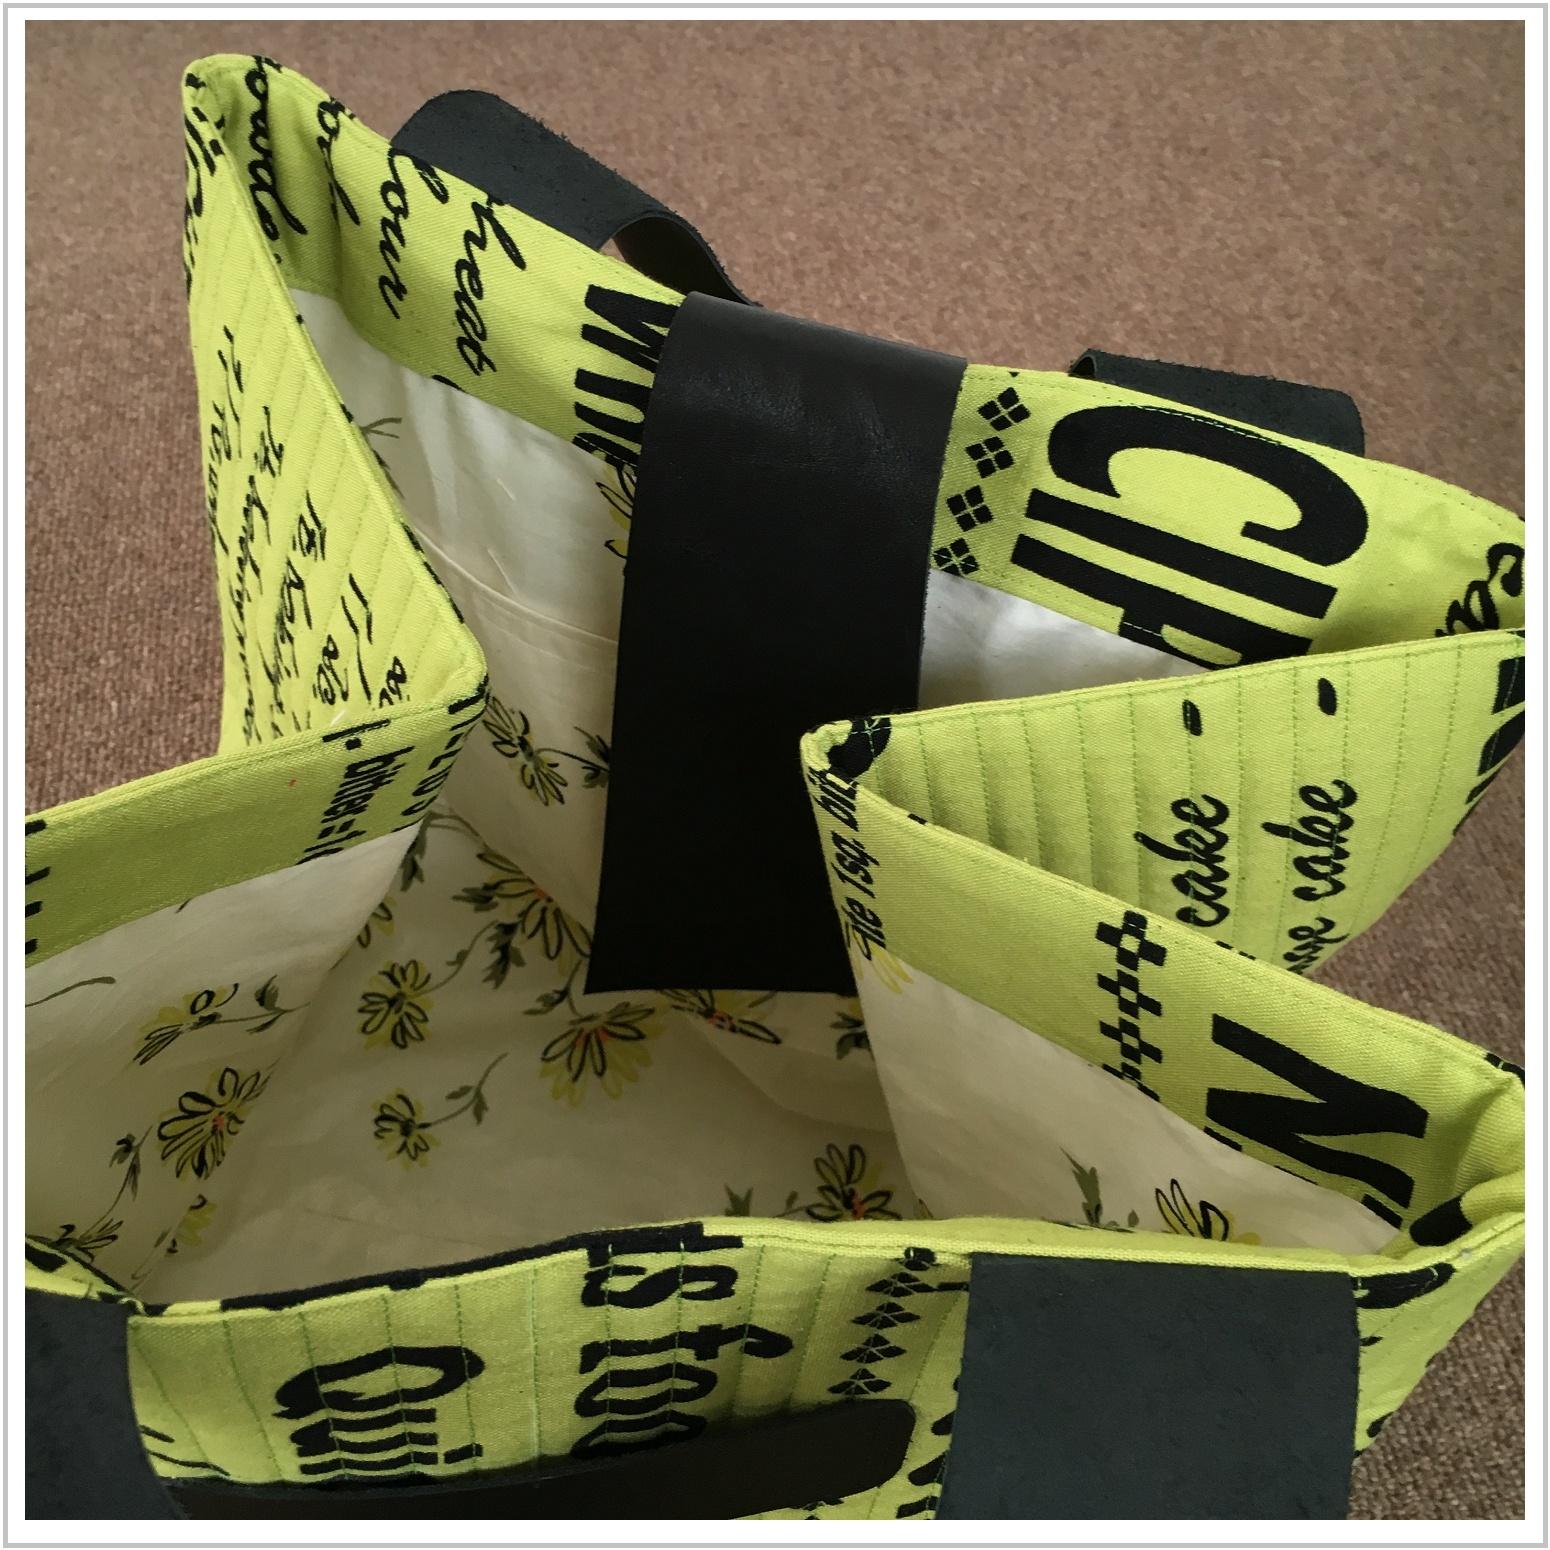 bag_3_808.jpg